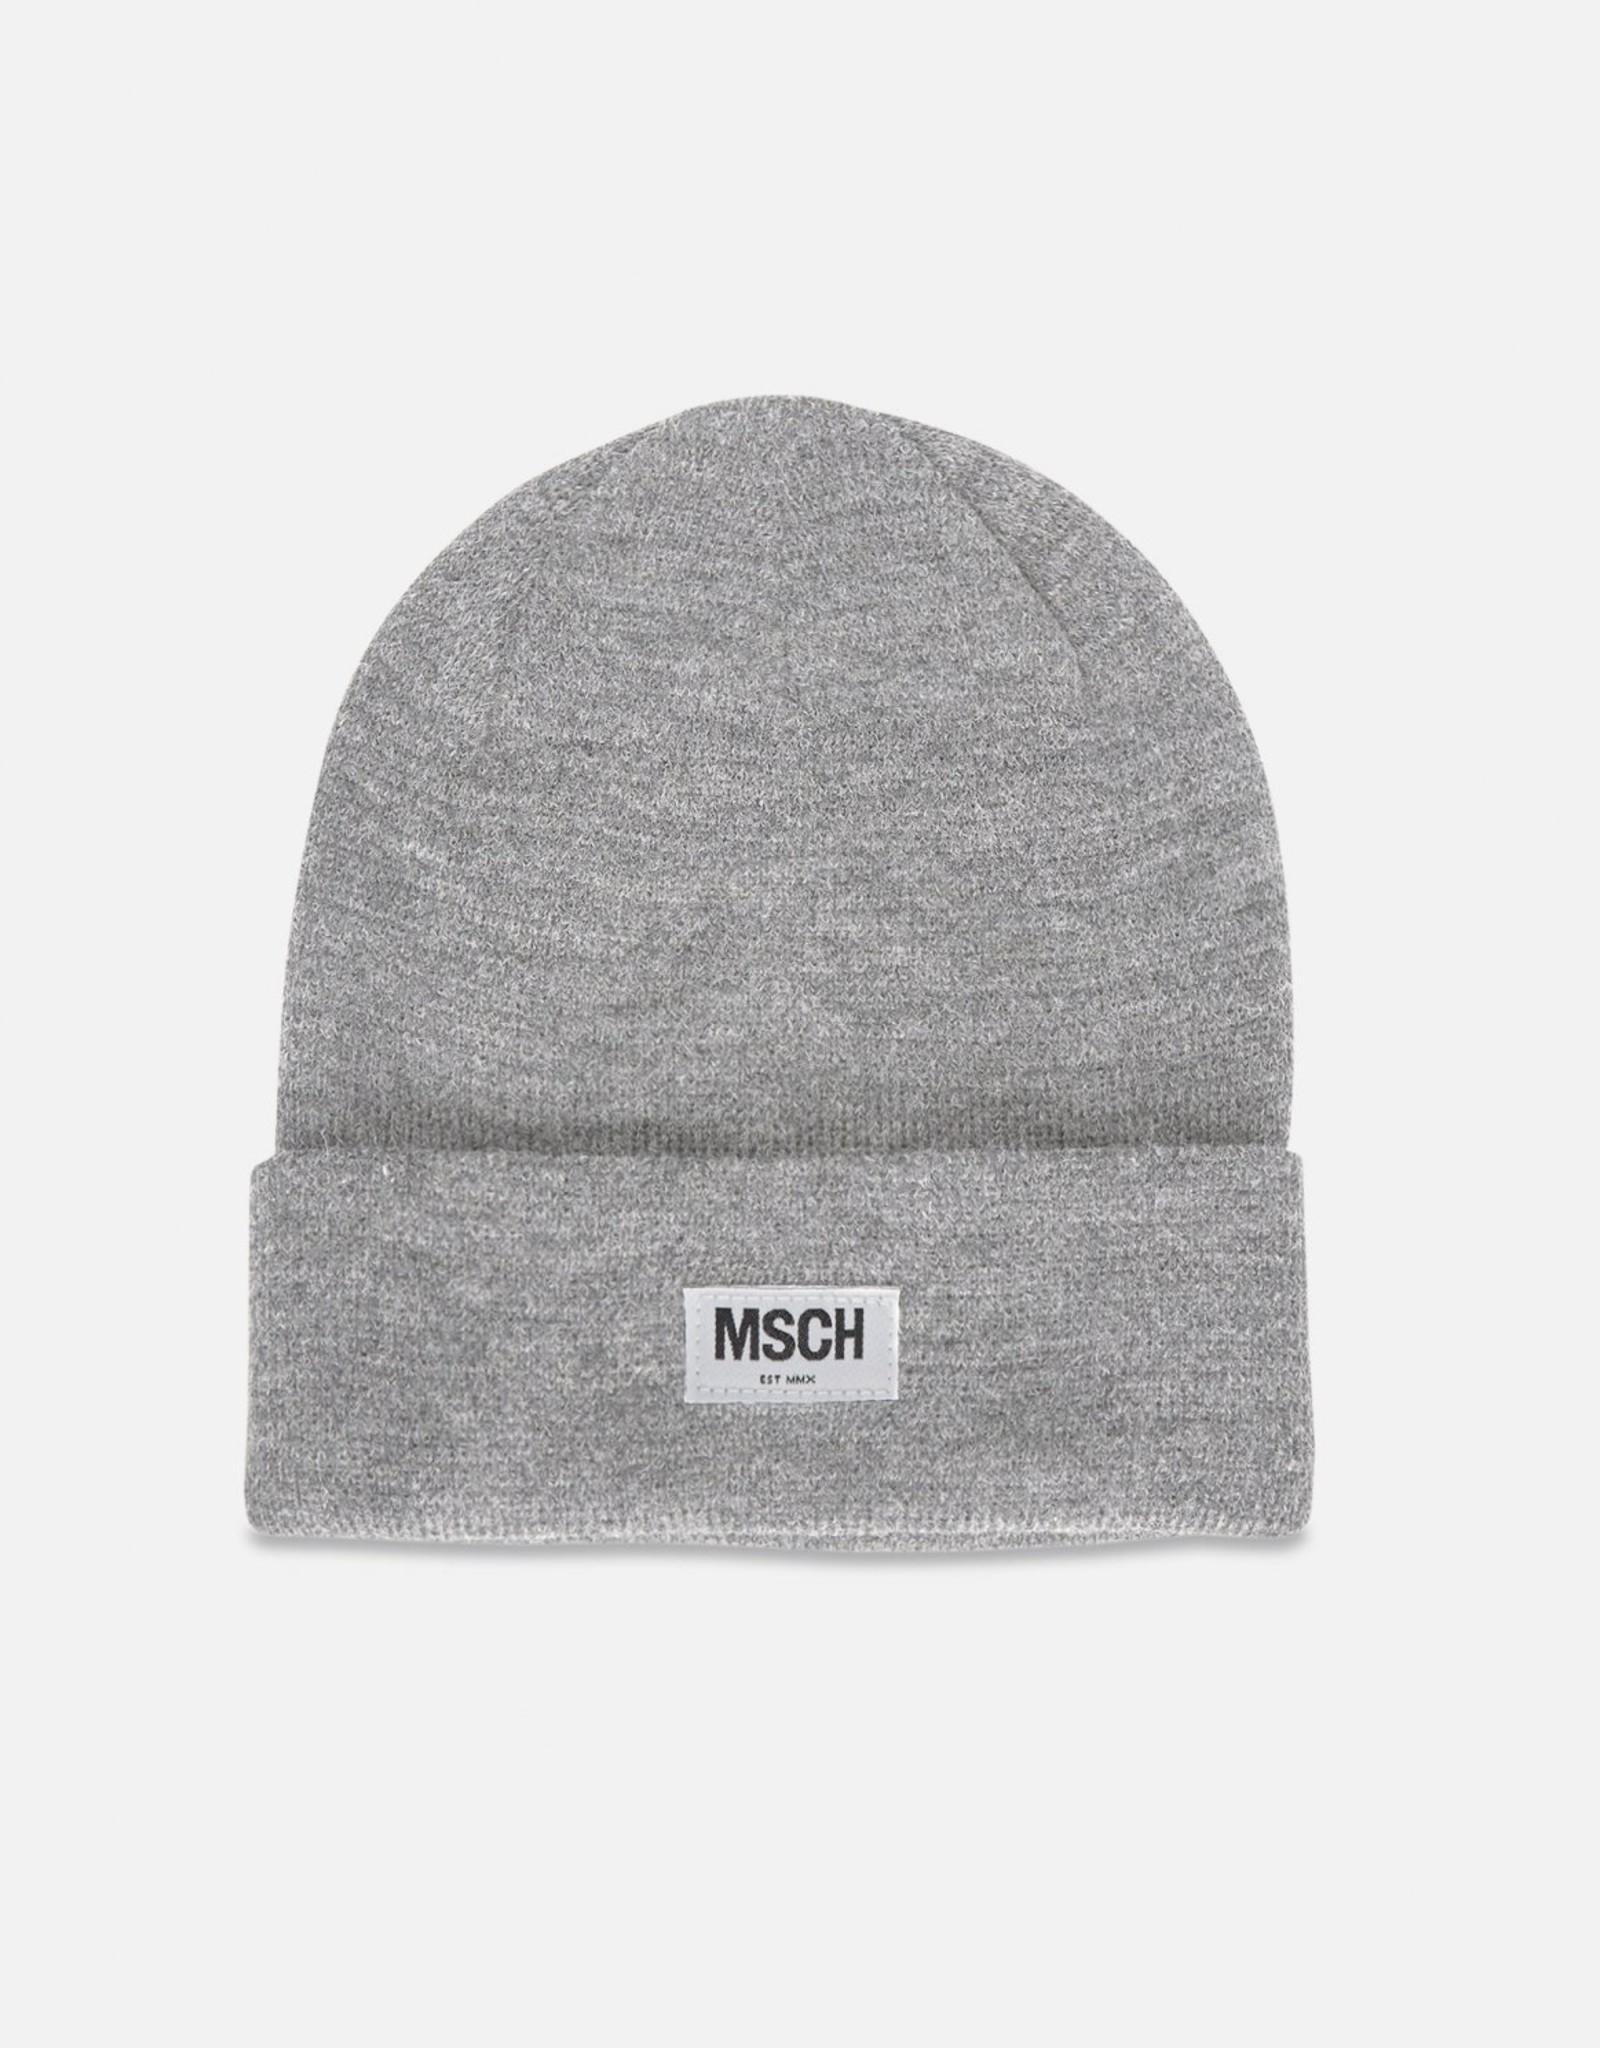 Moss Copenhagen MSCH - Mojo beanie, light grey